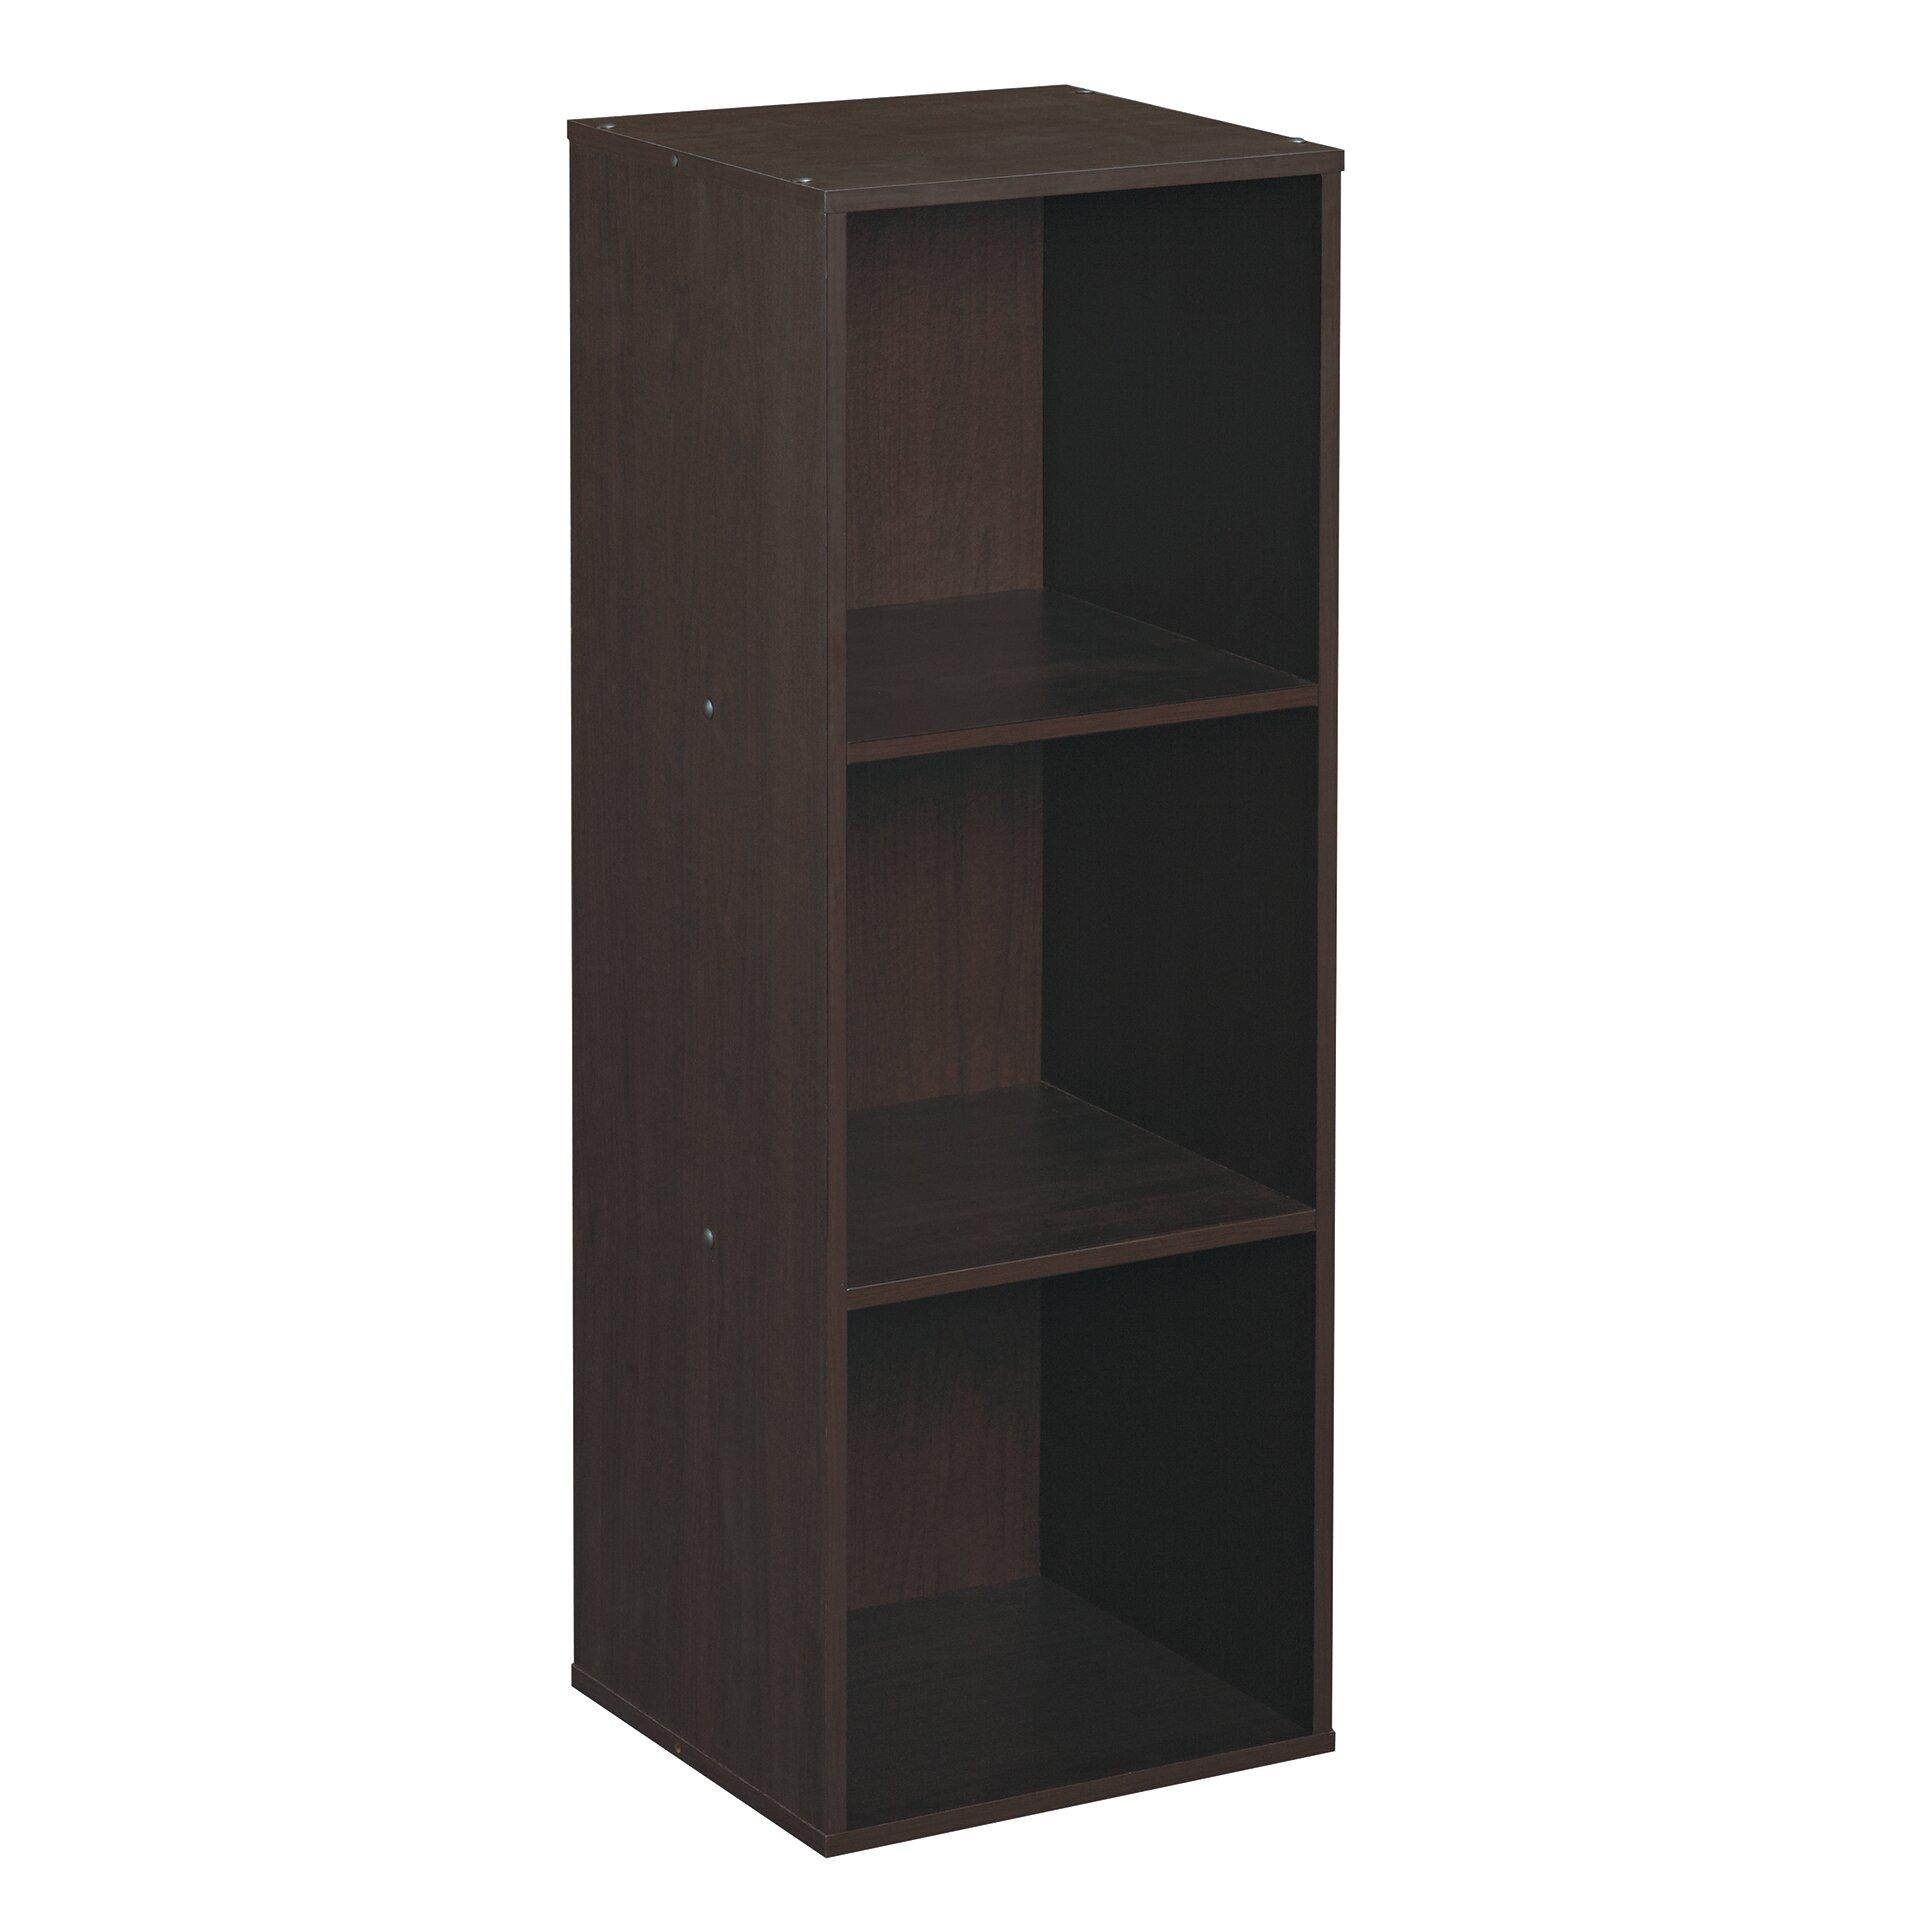 Closetmaid Cubeicals 35 Cube Unit Bookcase Reviews Wayfair